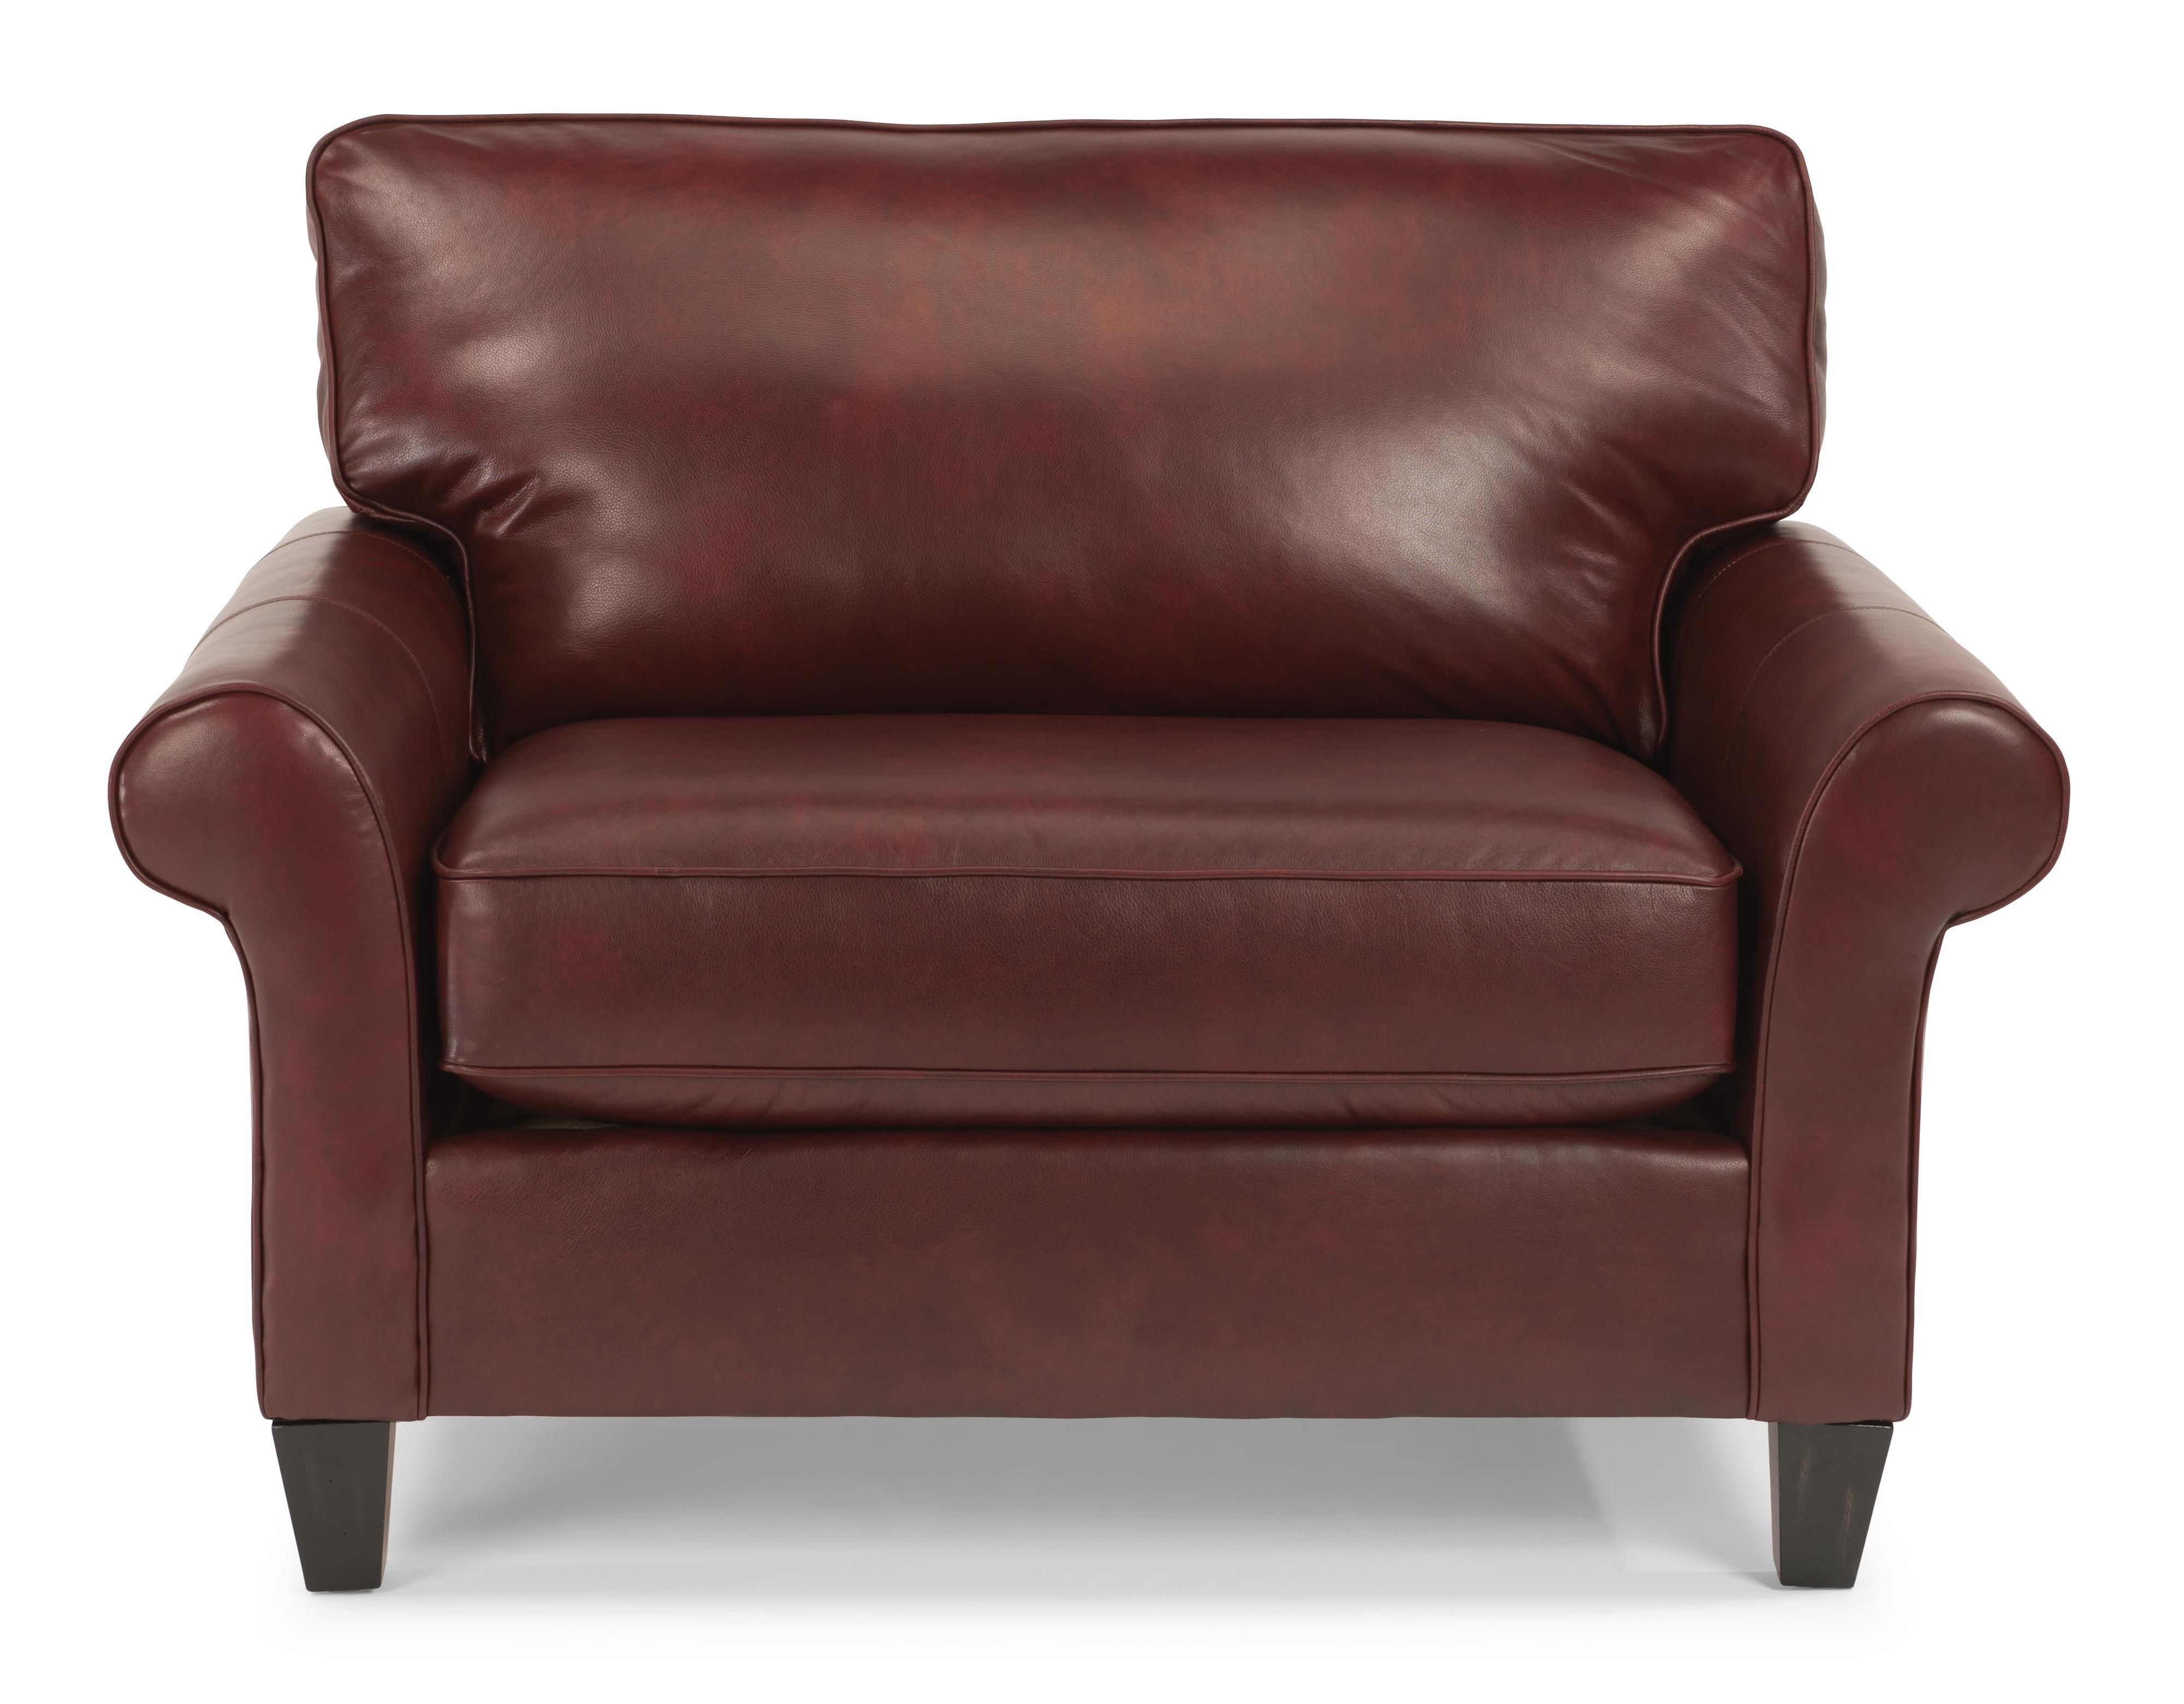 Westside Chair and 1/2 by Flexsteel at Jordan's Home Furnishings